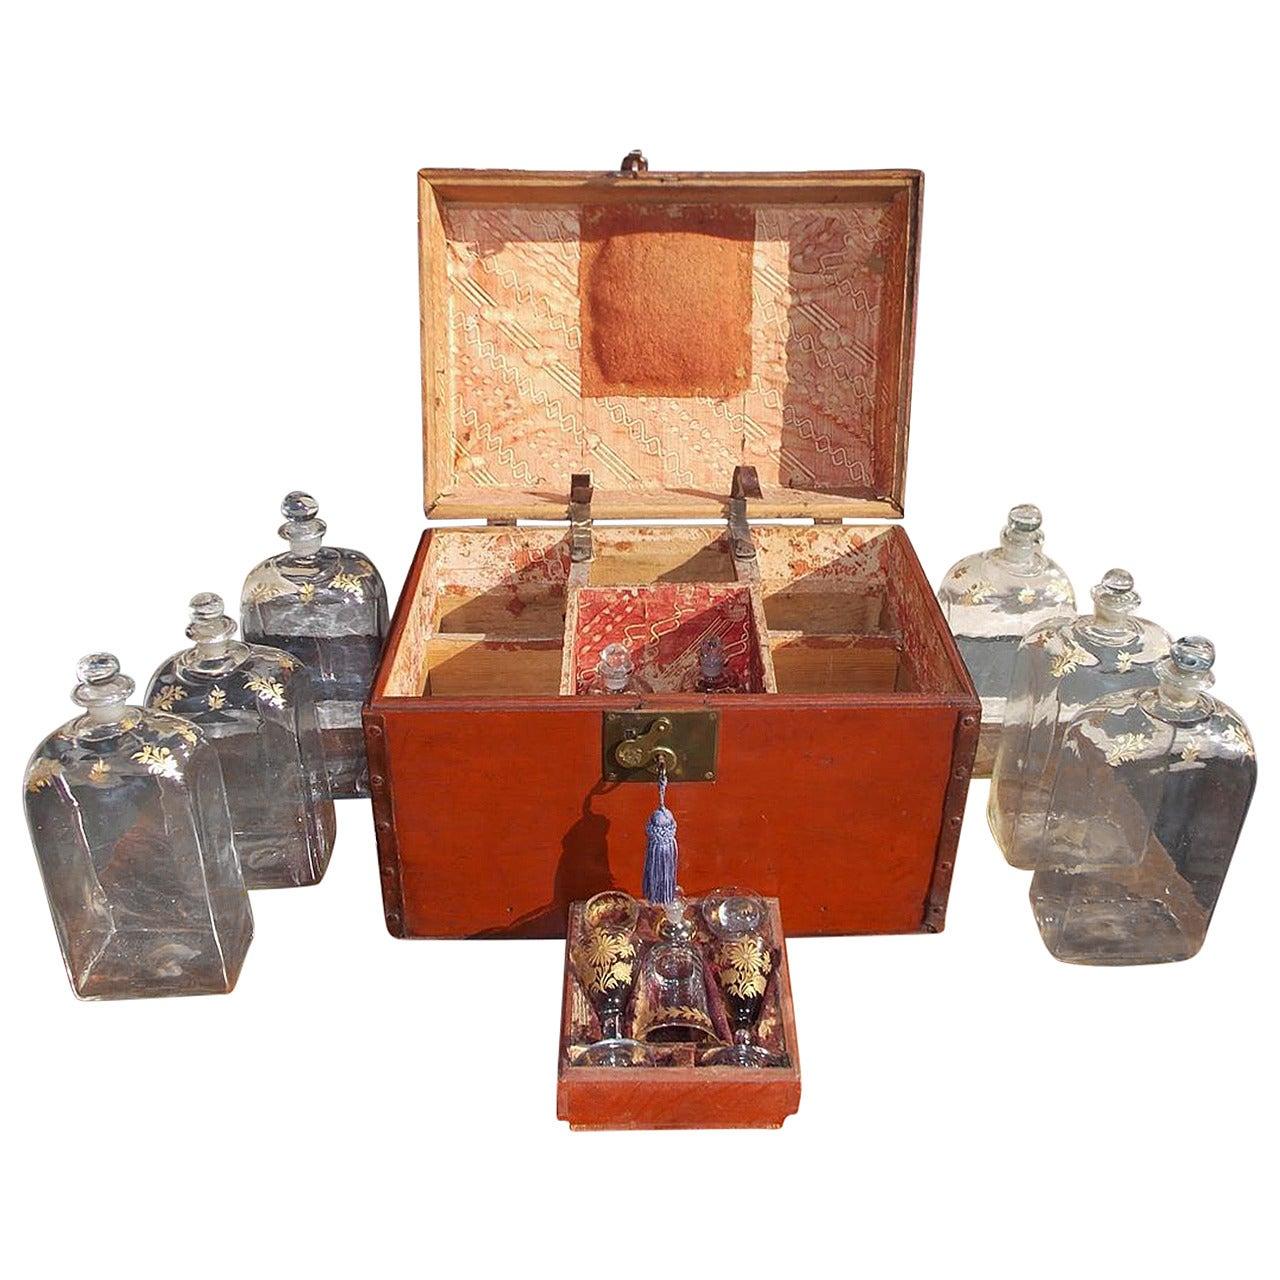 American Pine Liquor Traveling Case, Circa 1810